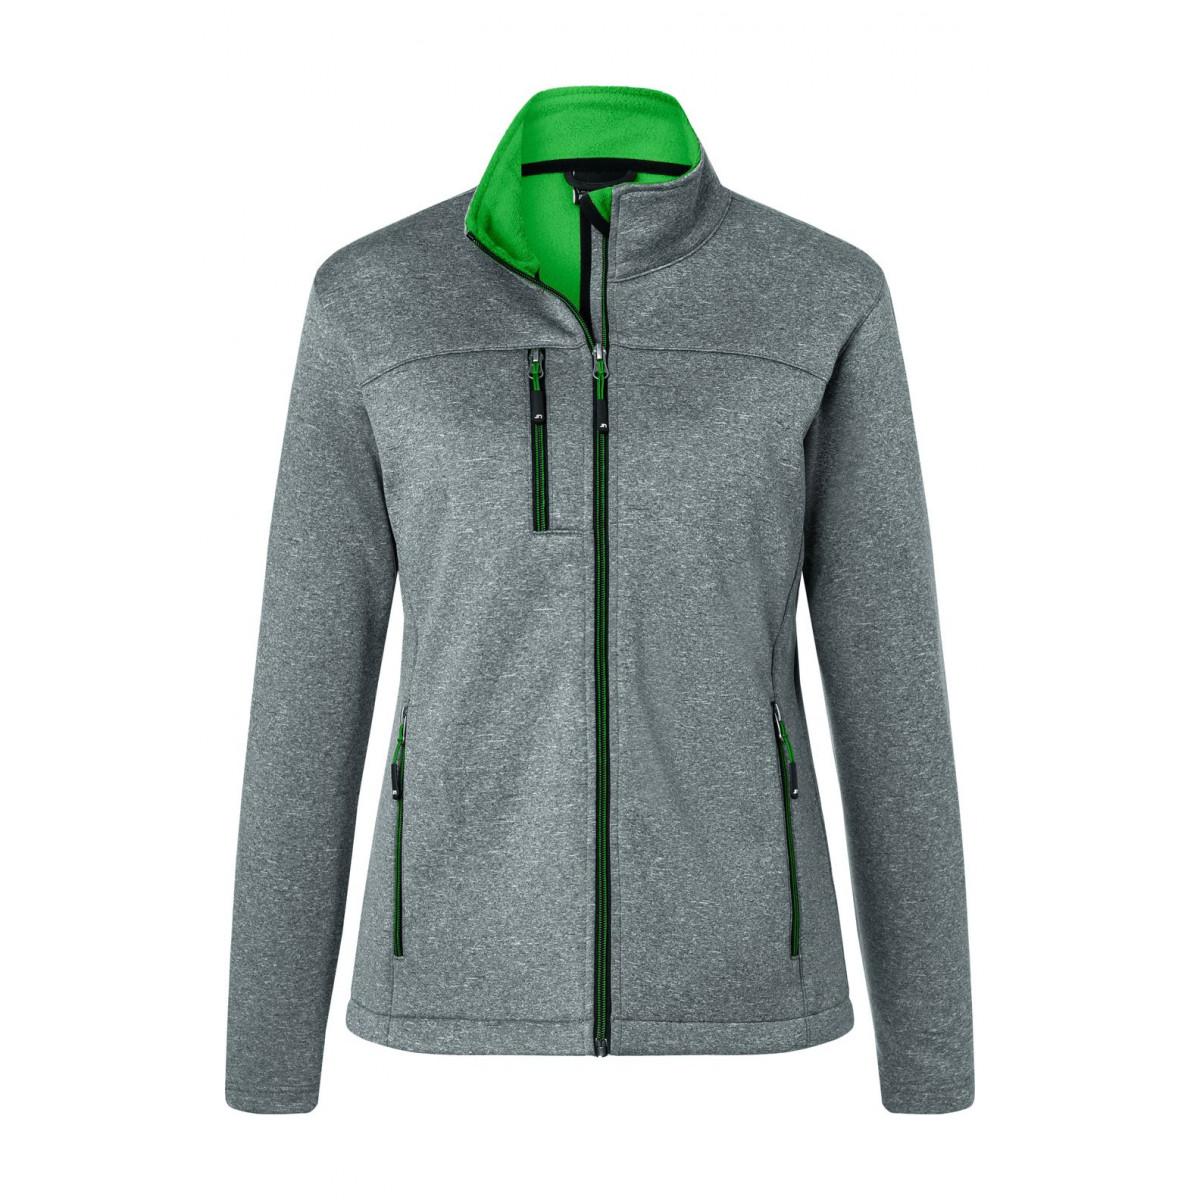 Куртка женская JN1147 Ladies Softshell Jacket - Темно-серый меланж/Насыщенный зеленый